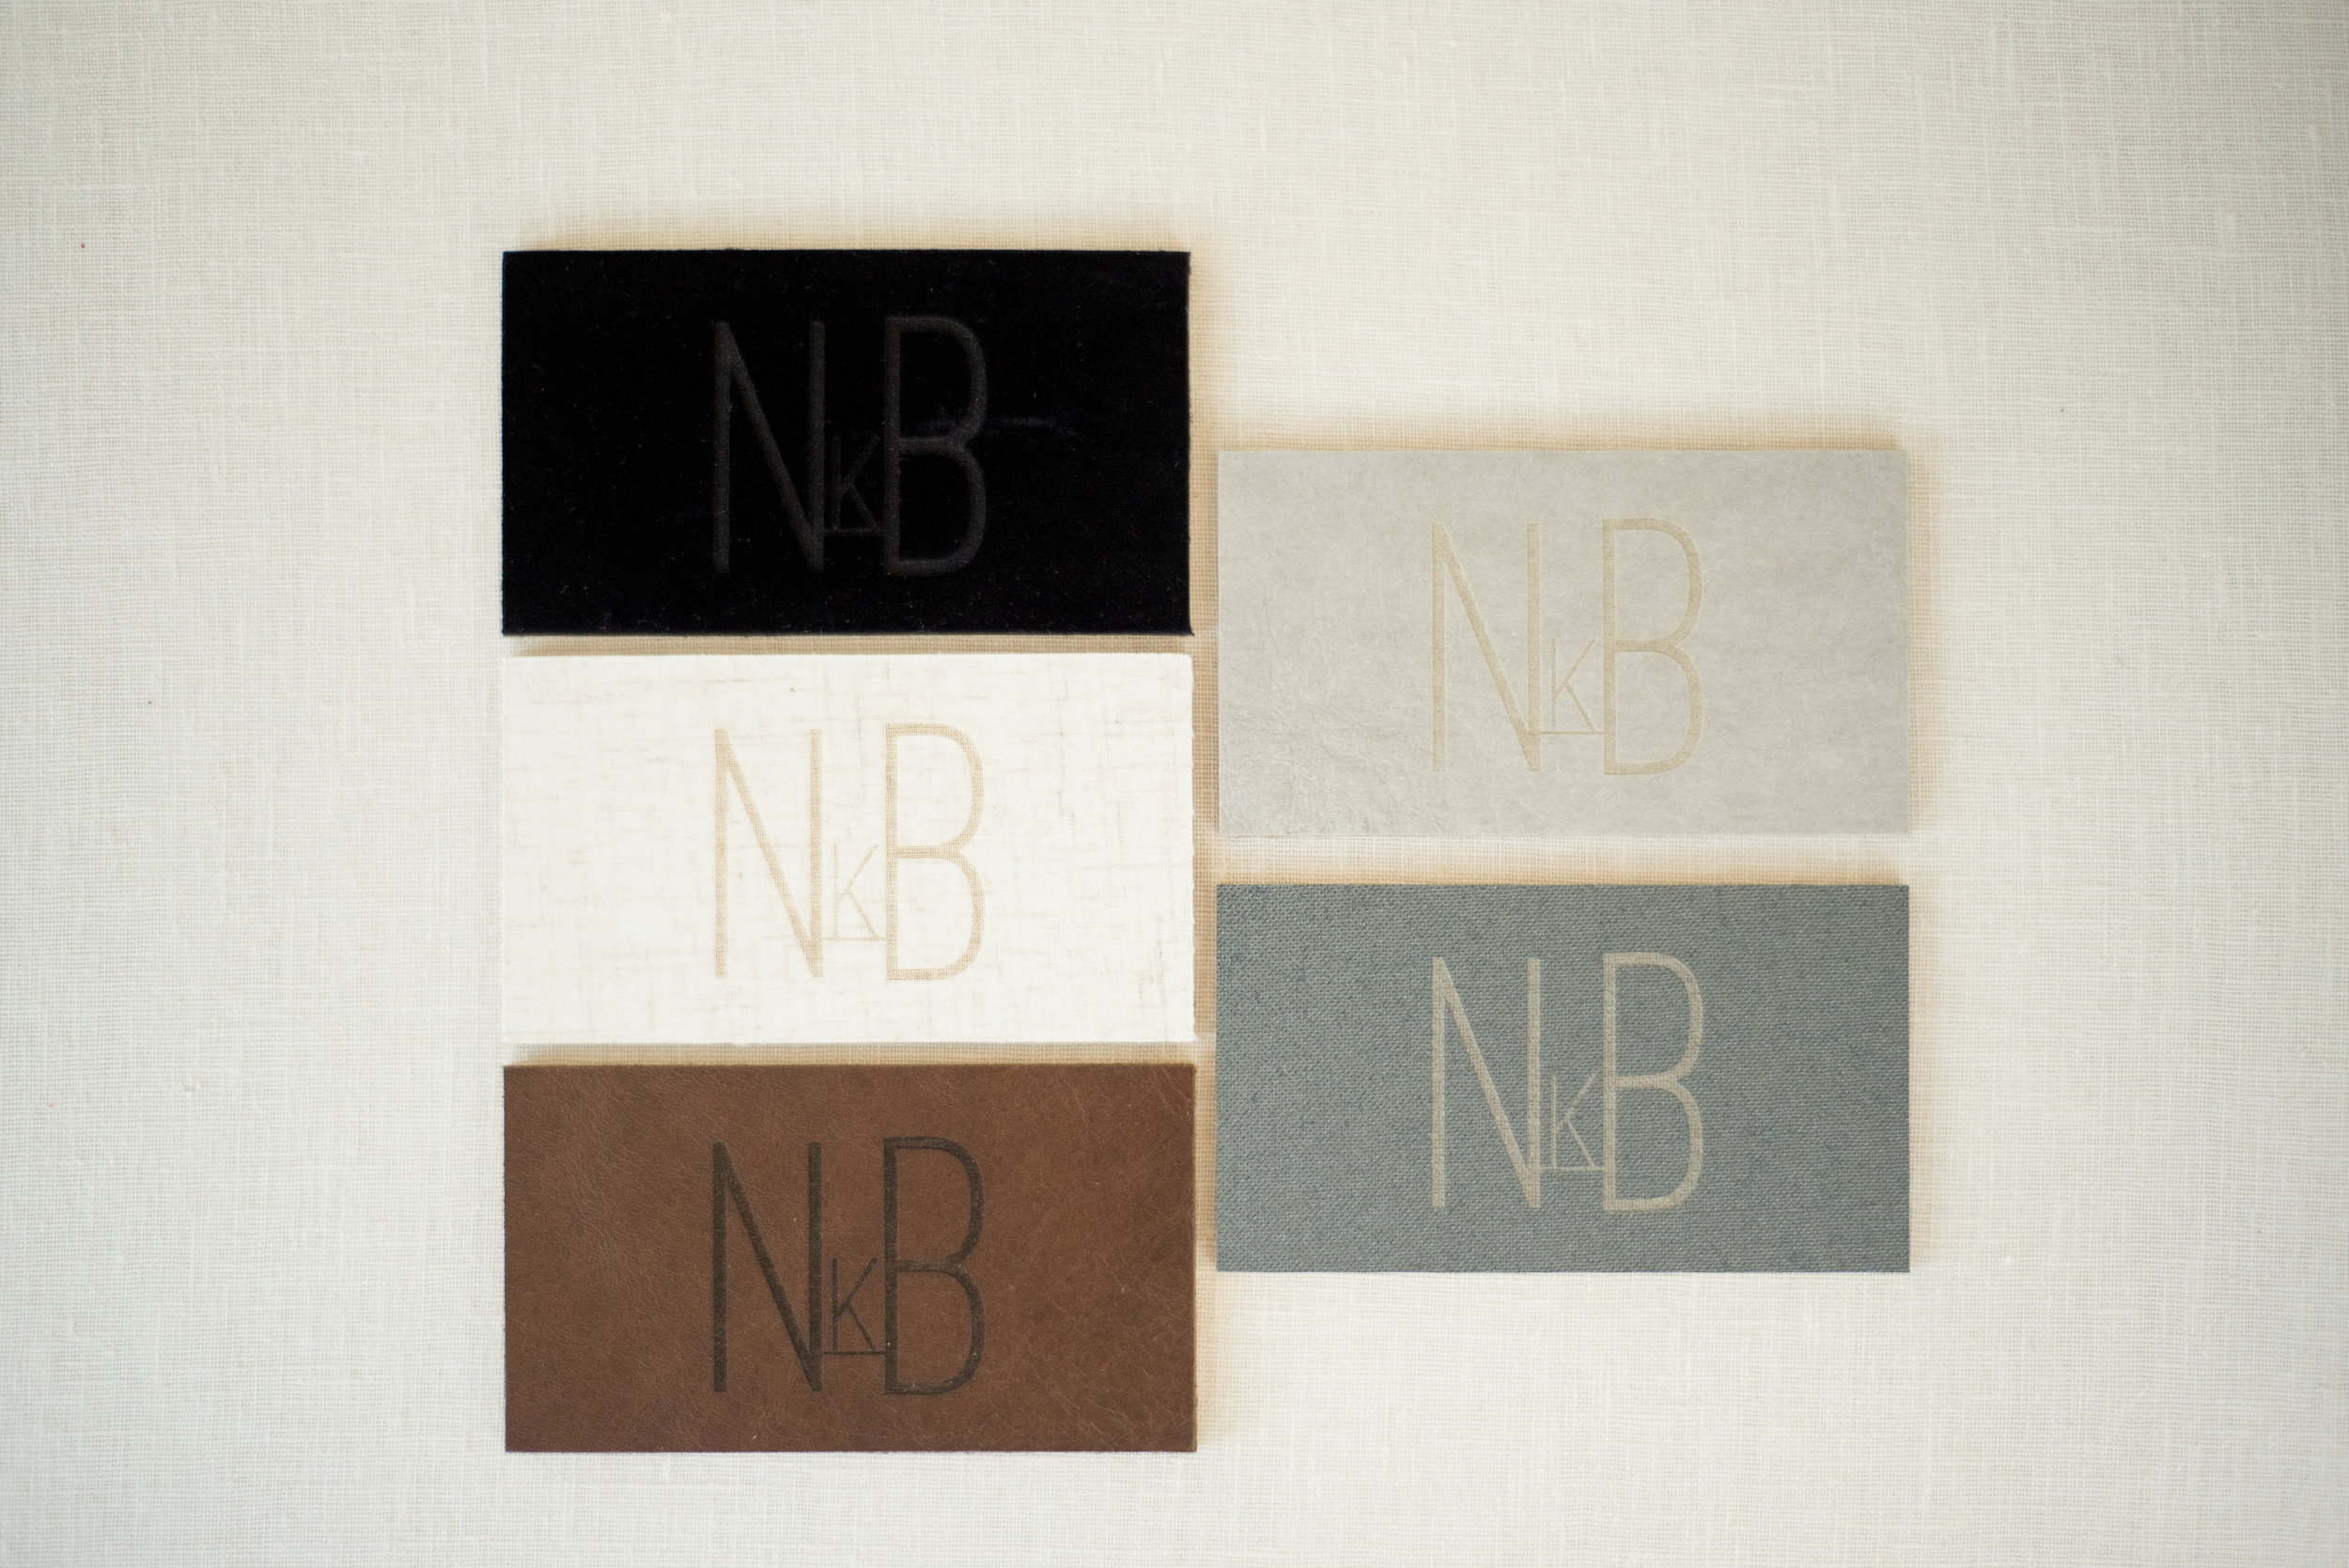 albumsnkb-1.jpg